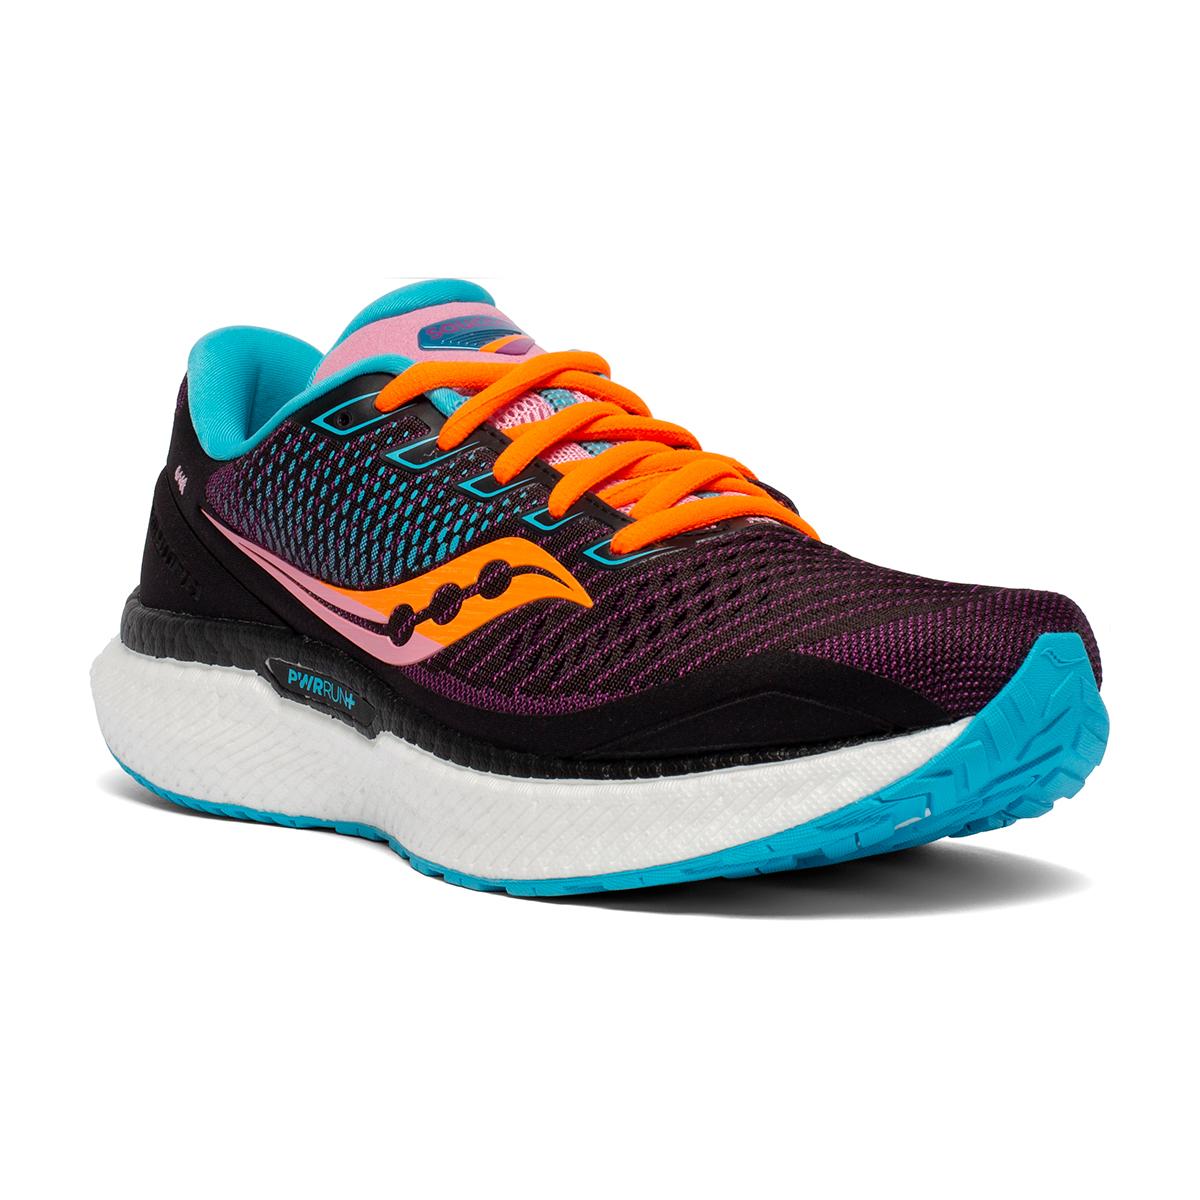 Women's Saucony Triumph 18 Running Shoe - Color: Future/Black - Size: 5 - Width: Regular, Future/Black, large, image 2